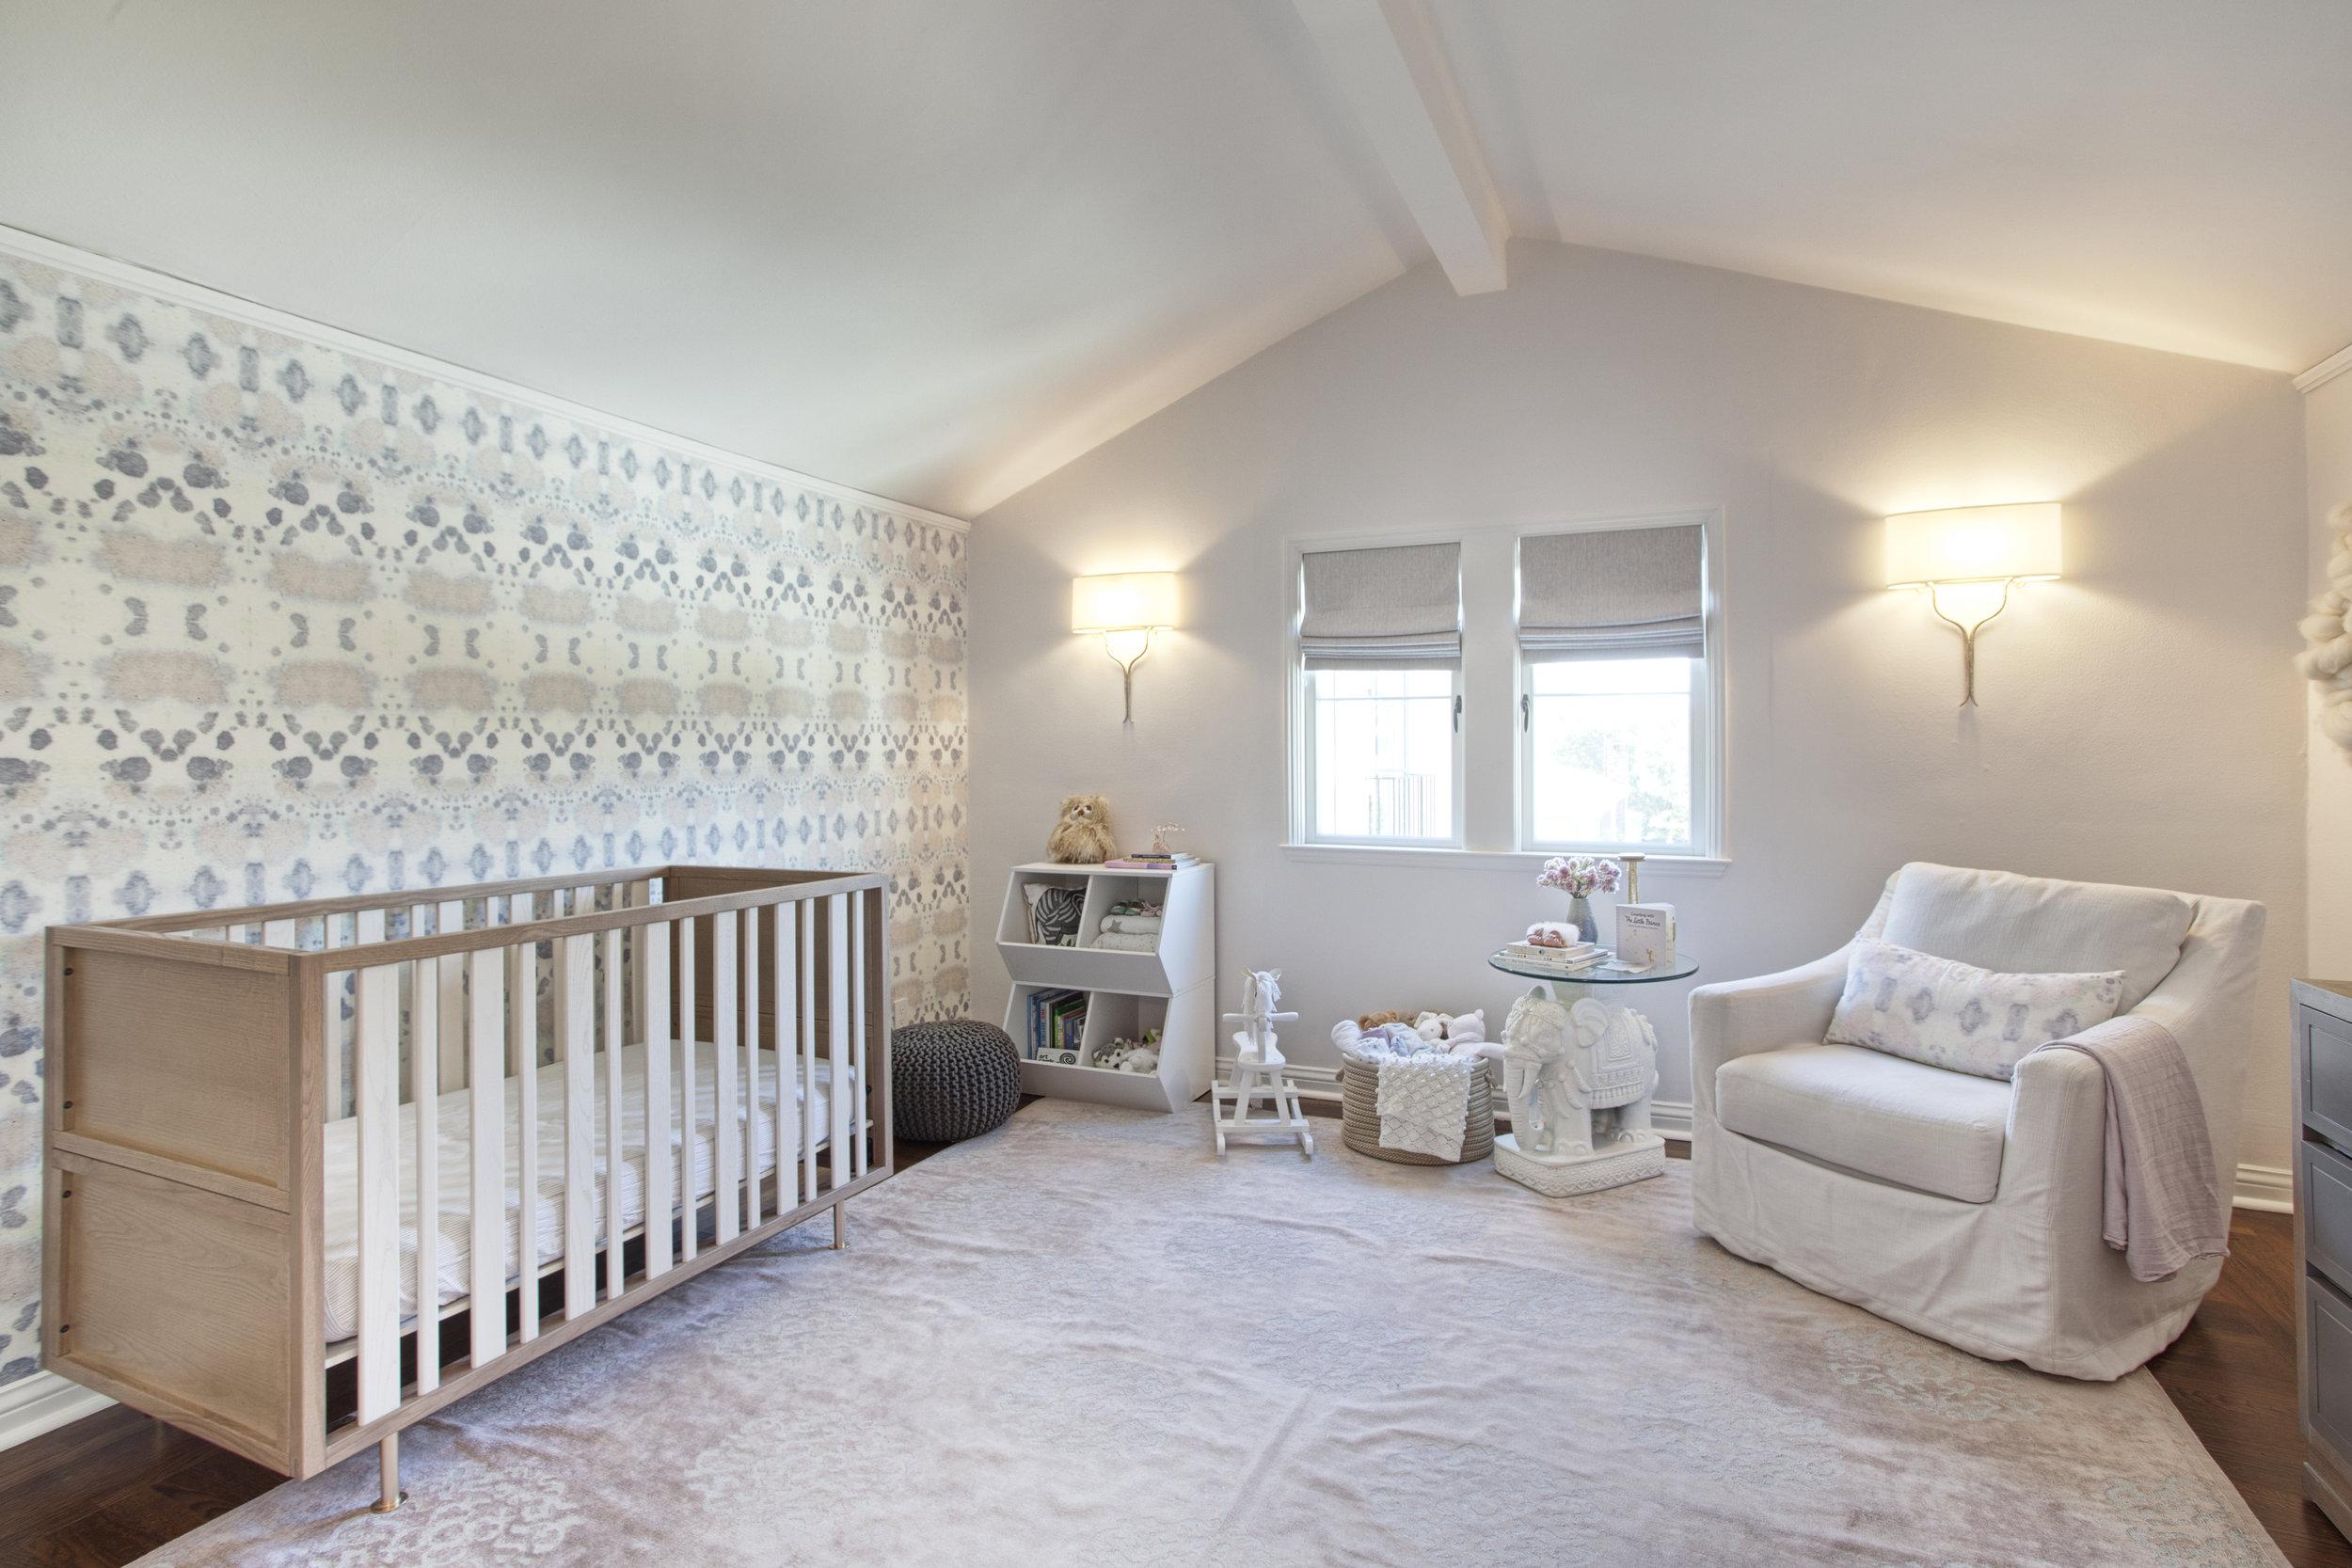 KJM interiors | Nursery